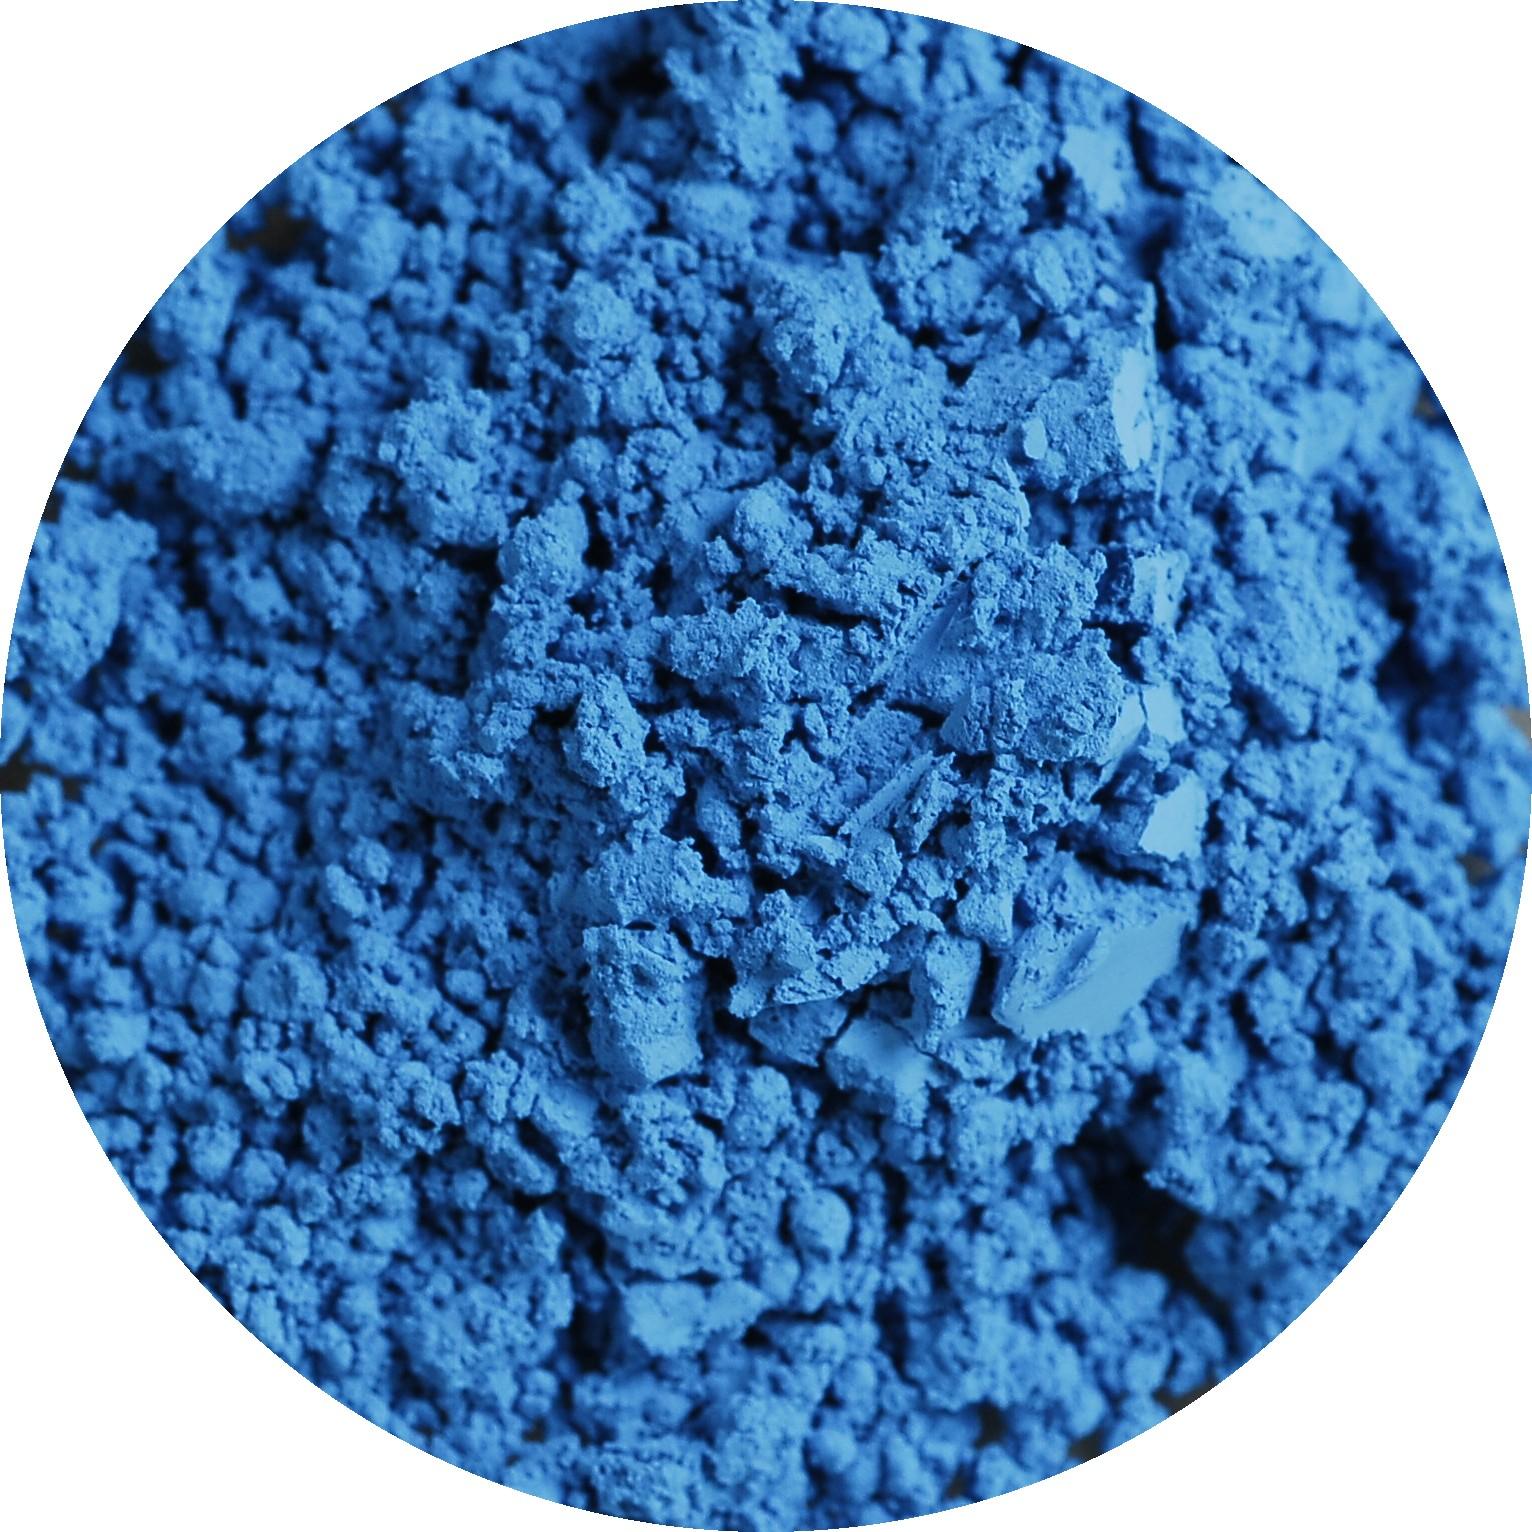 Cerulean blue PB35, photo by Stephzzz